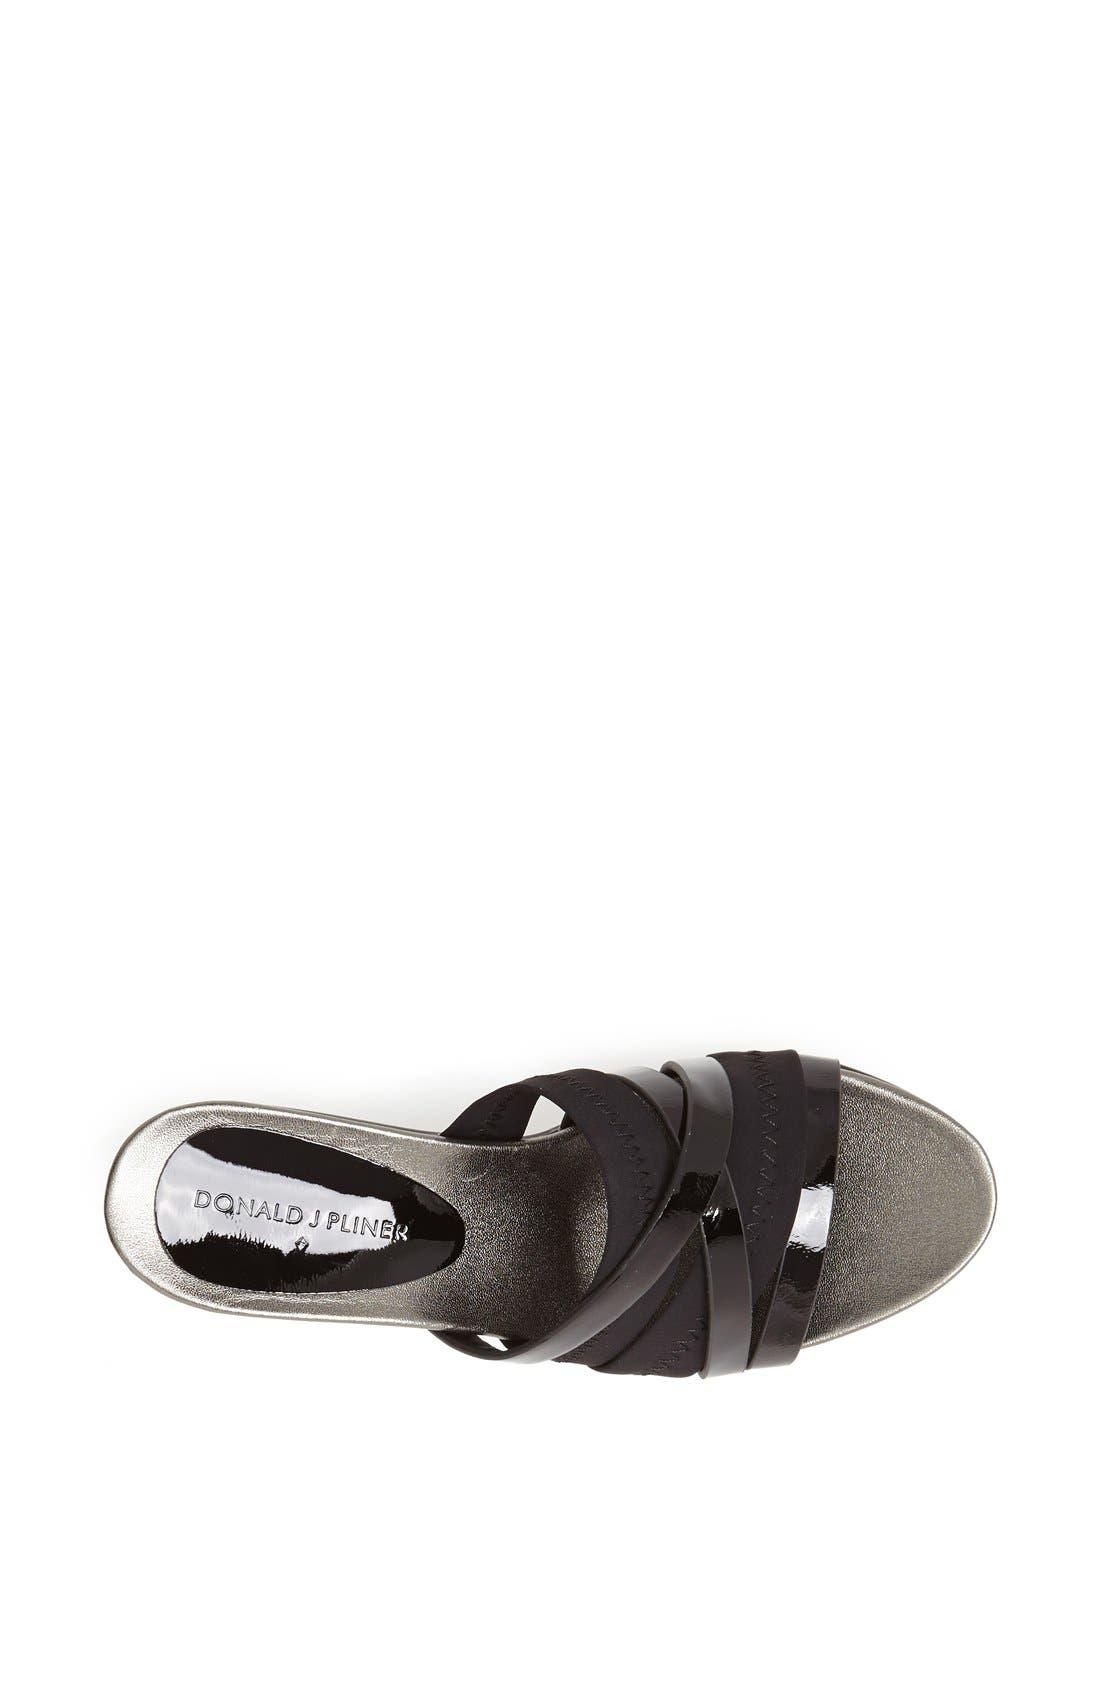 Alternate Image 3  - Donald J Pliner 'Jean' Slide Sandal